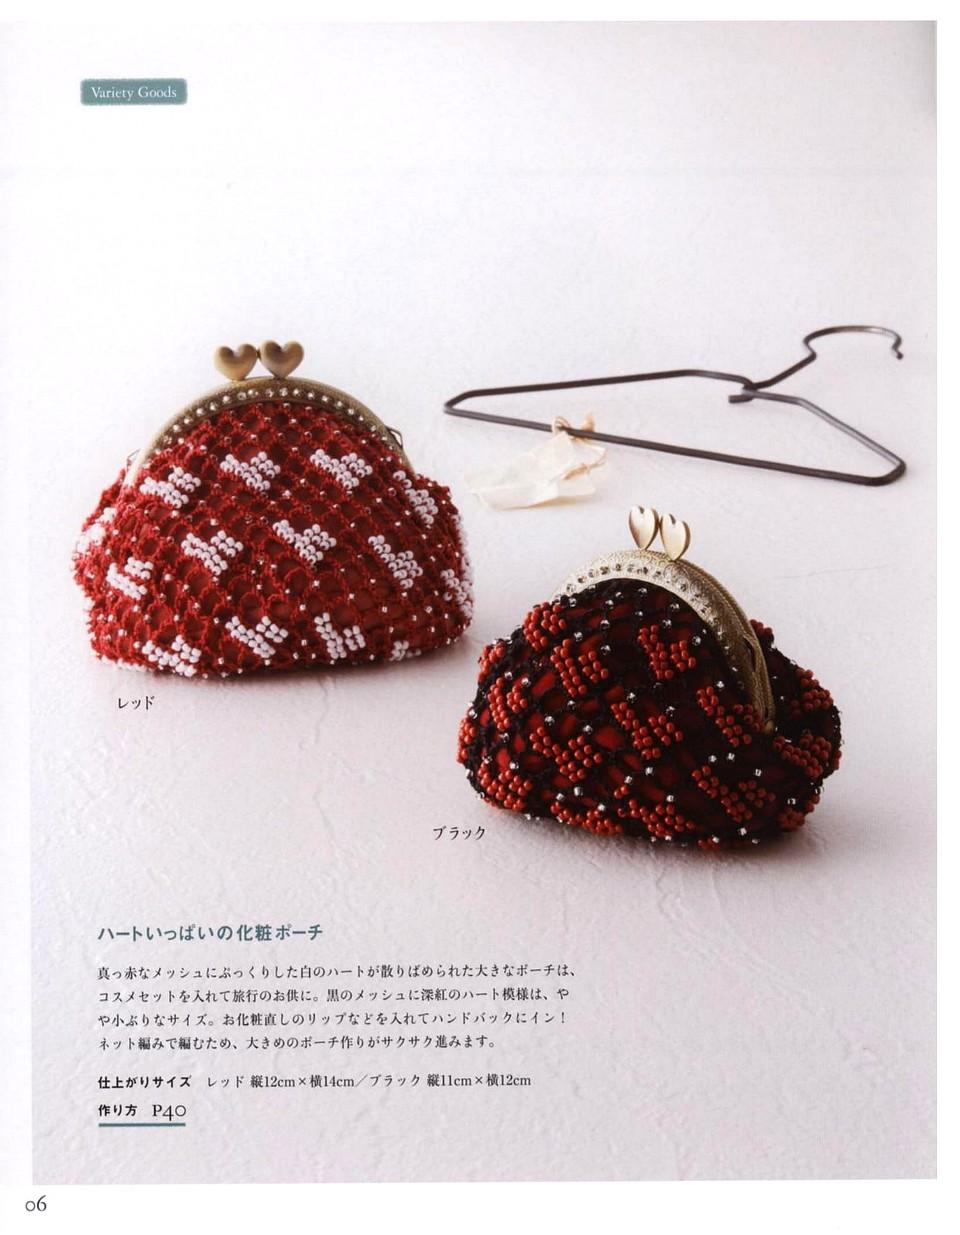 717 Beads Crochet 17-07